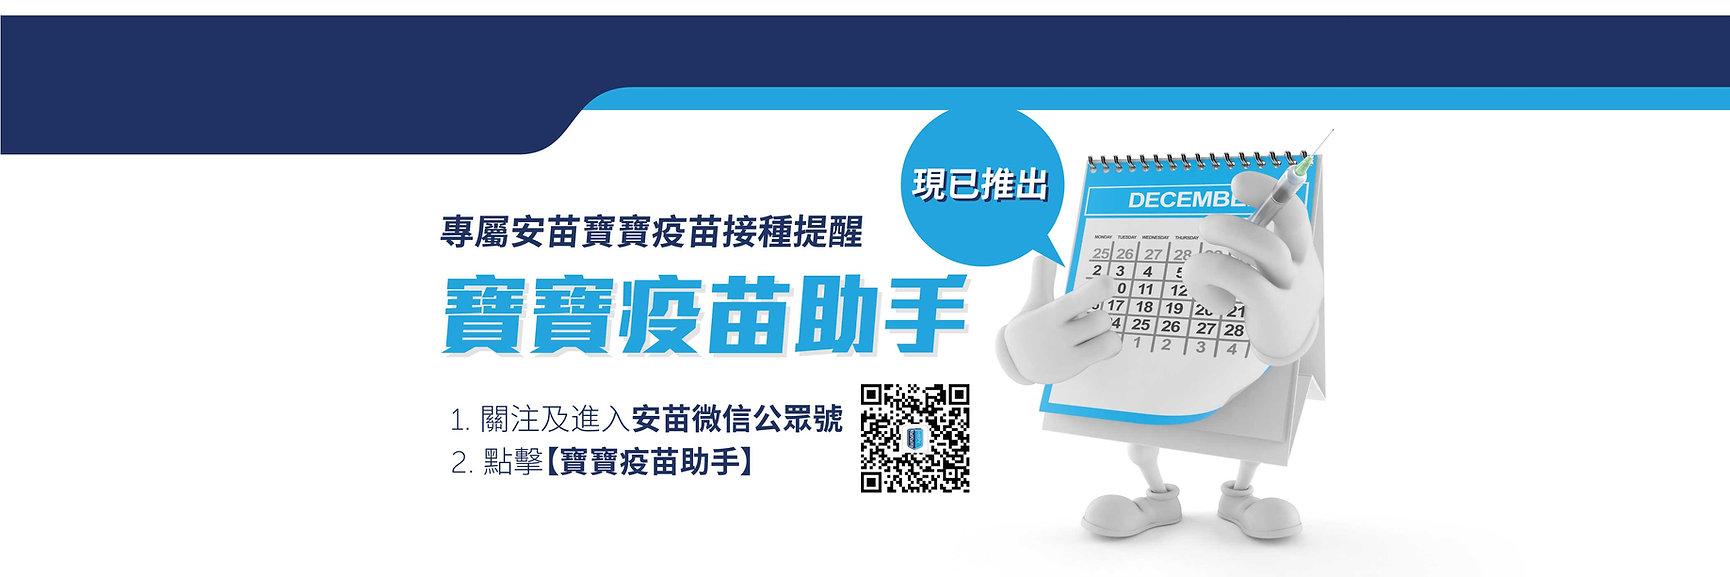 Compress-HKPV-E-shop-banner-6January2020